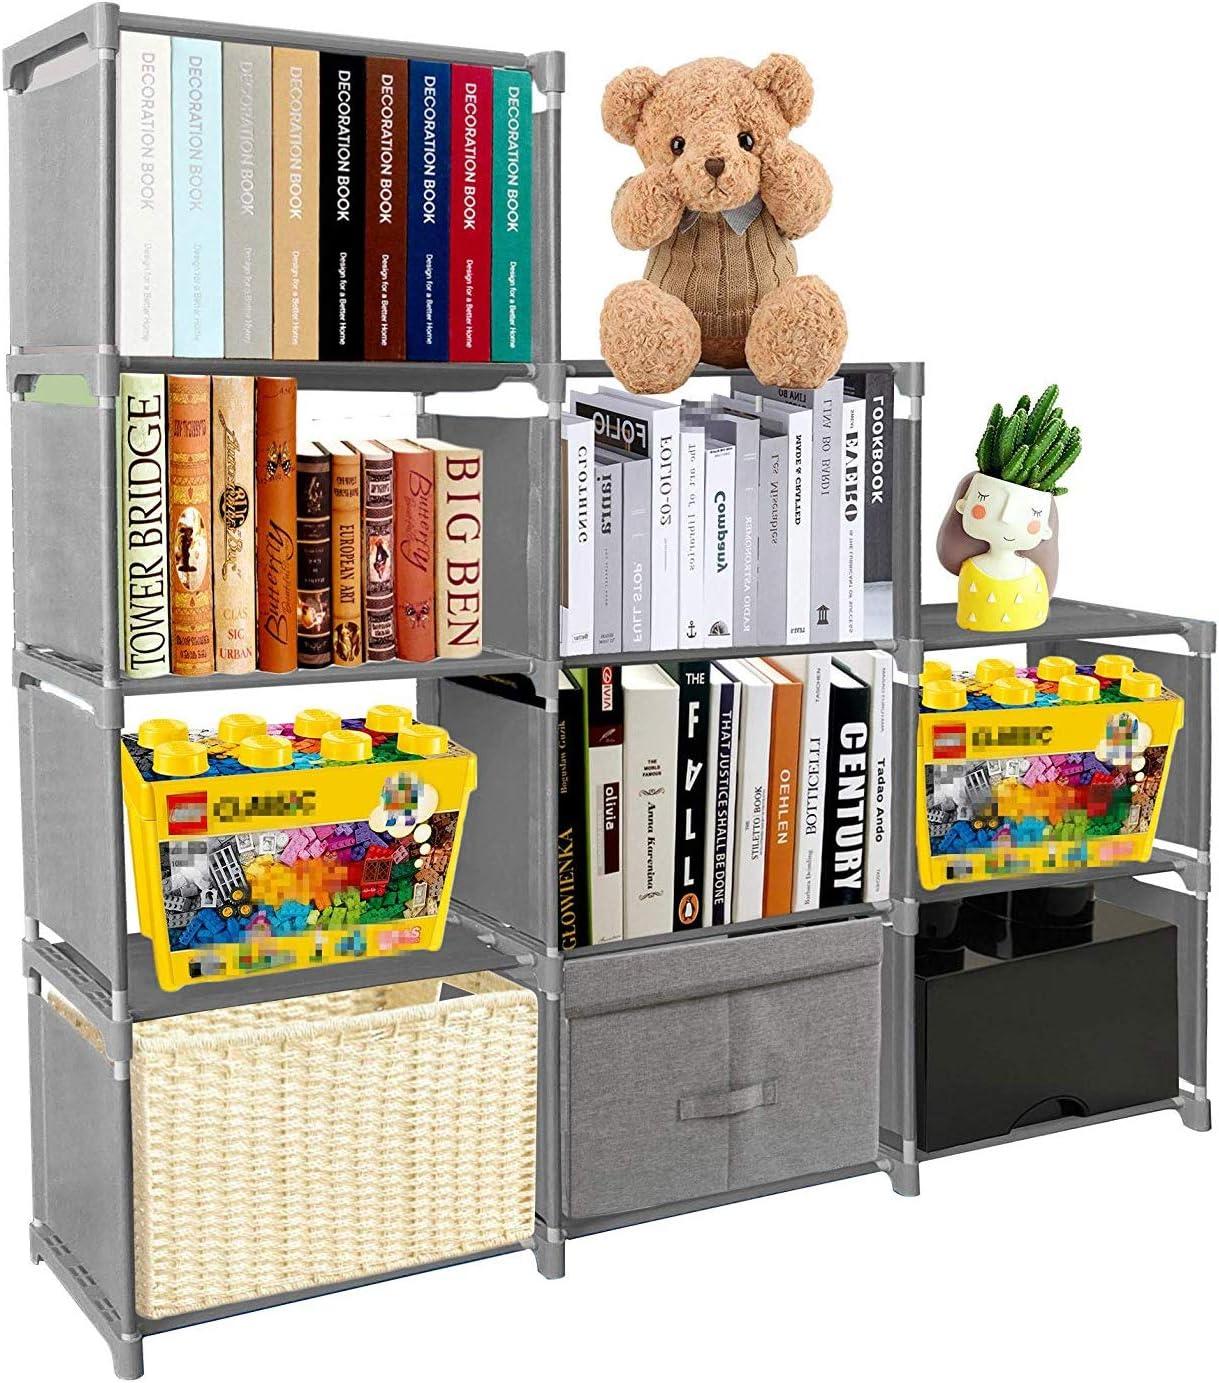 PENGKE Kids Bookshelf 9 Cubes Max 79% Shipping included OFF Storage Pl Book Shelf Office